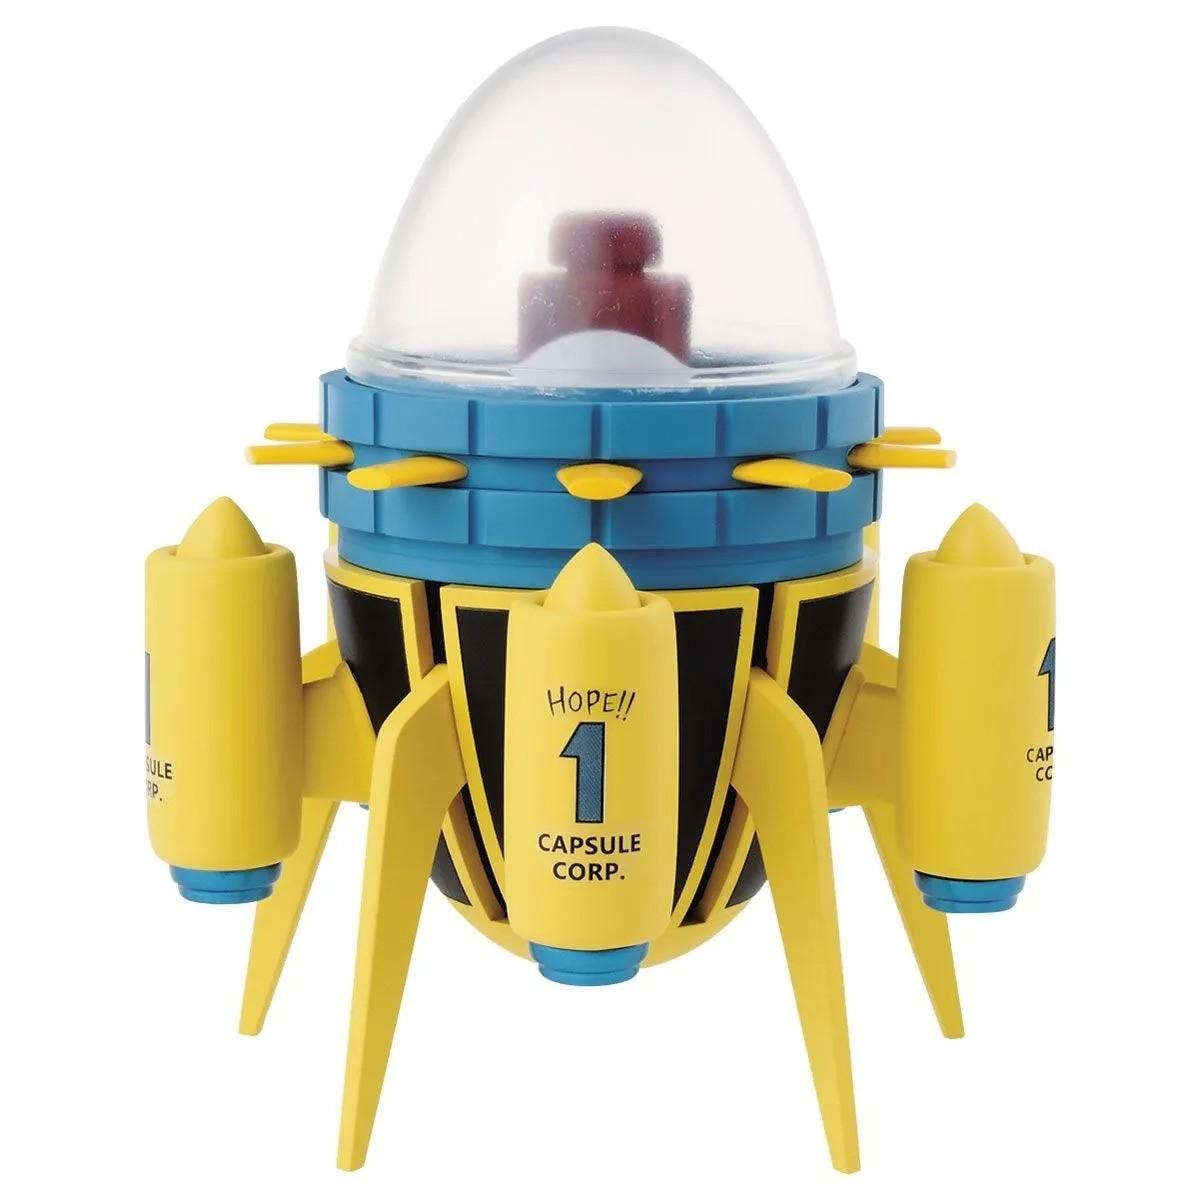 DRAGON BALL SUPER MEGA WCF FIGURE COLLECTION - TIME MACHINE